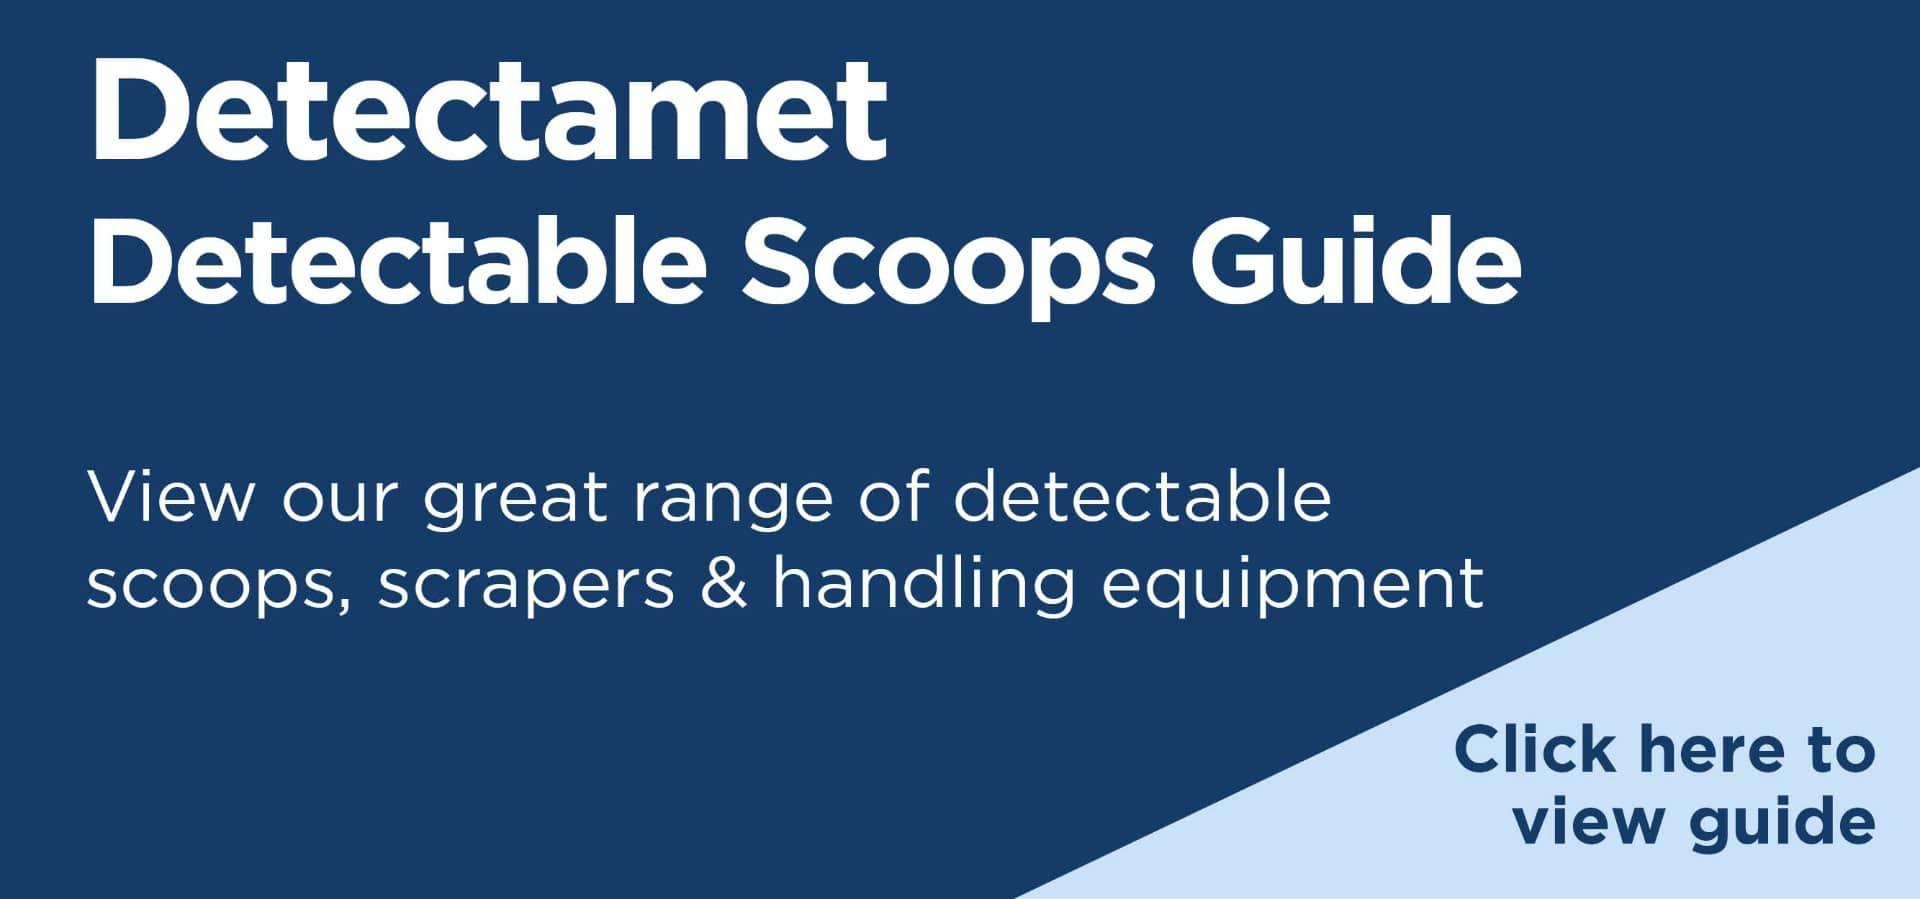 Detectamet Detectable Scoops & Scrapers Guide